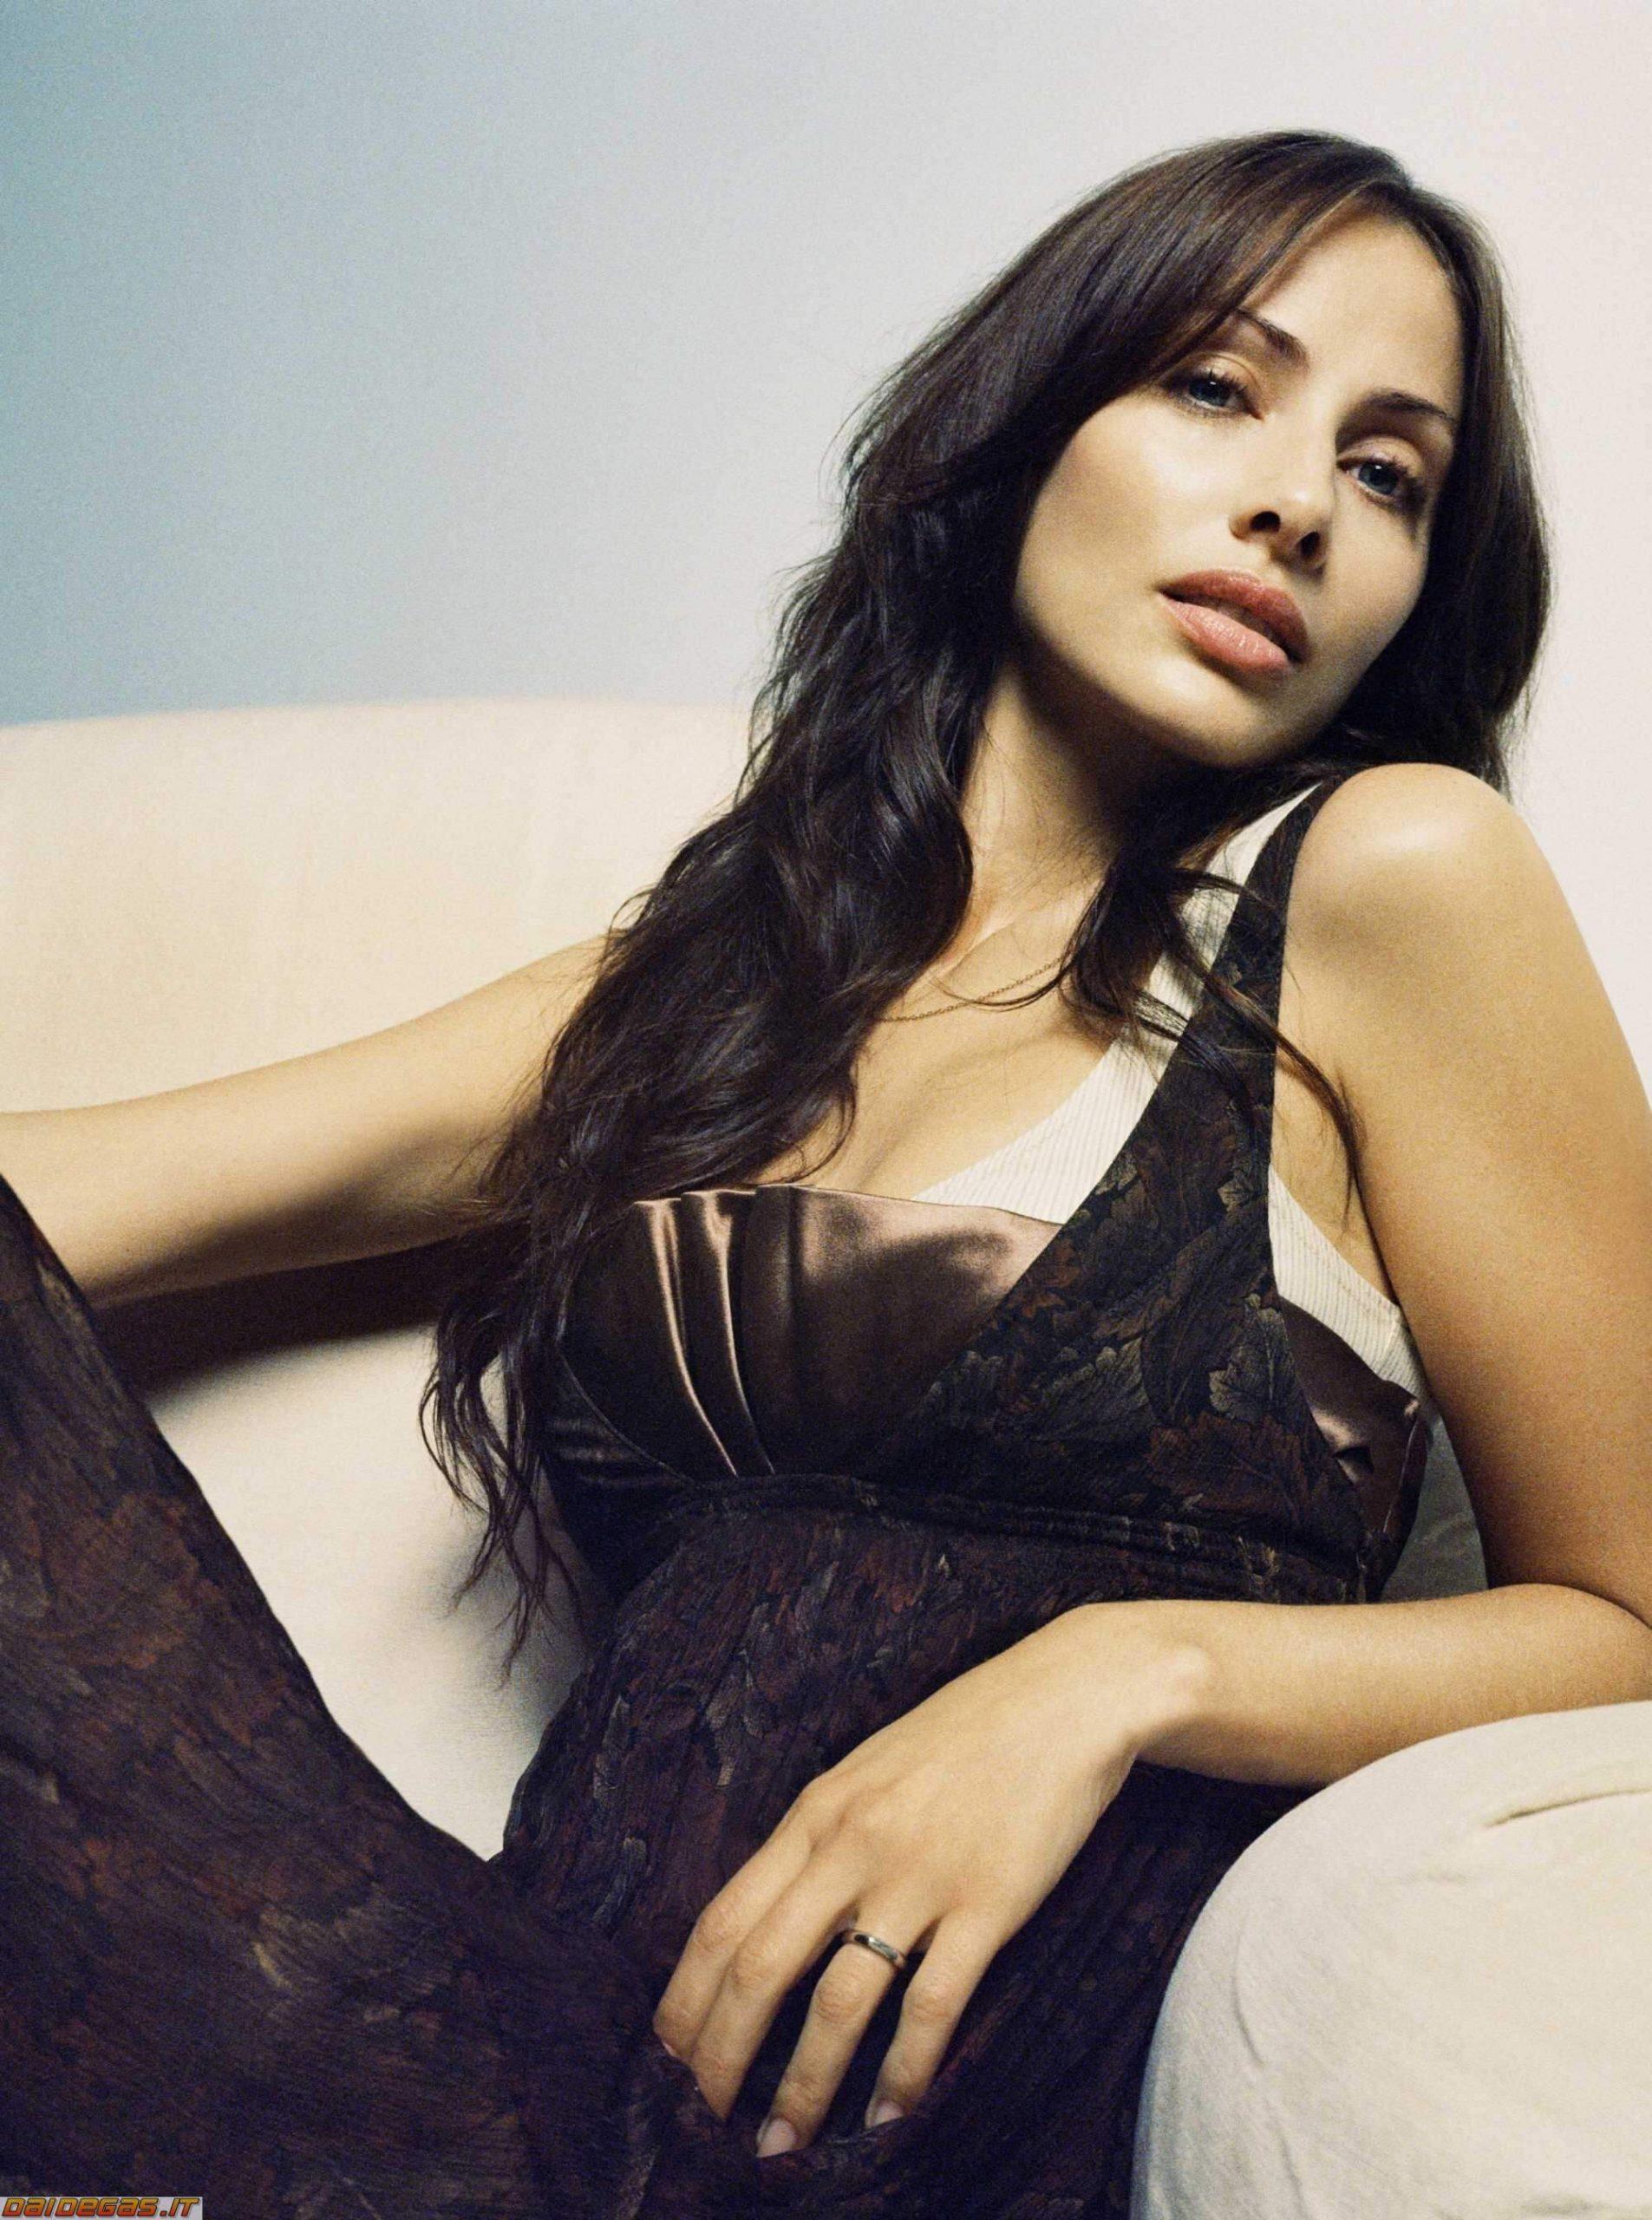 Natalie Imbruglia sexy looks pics